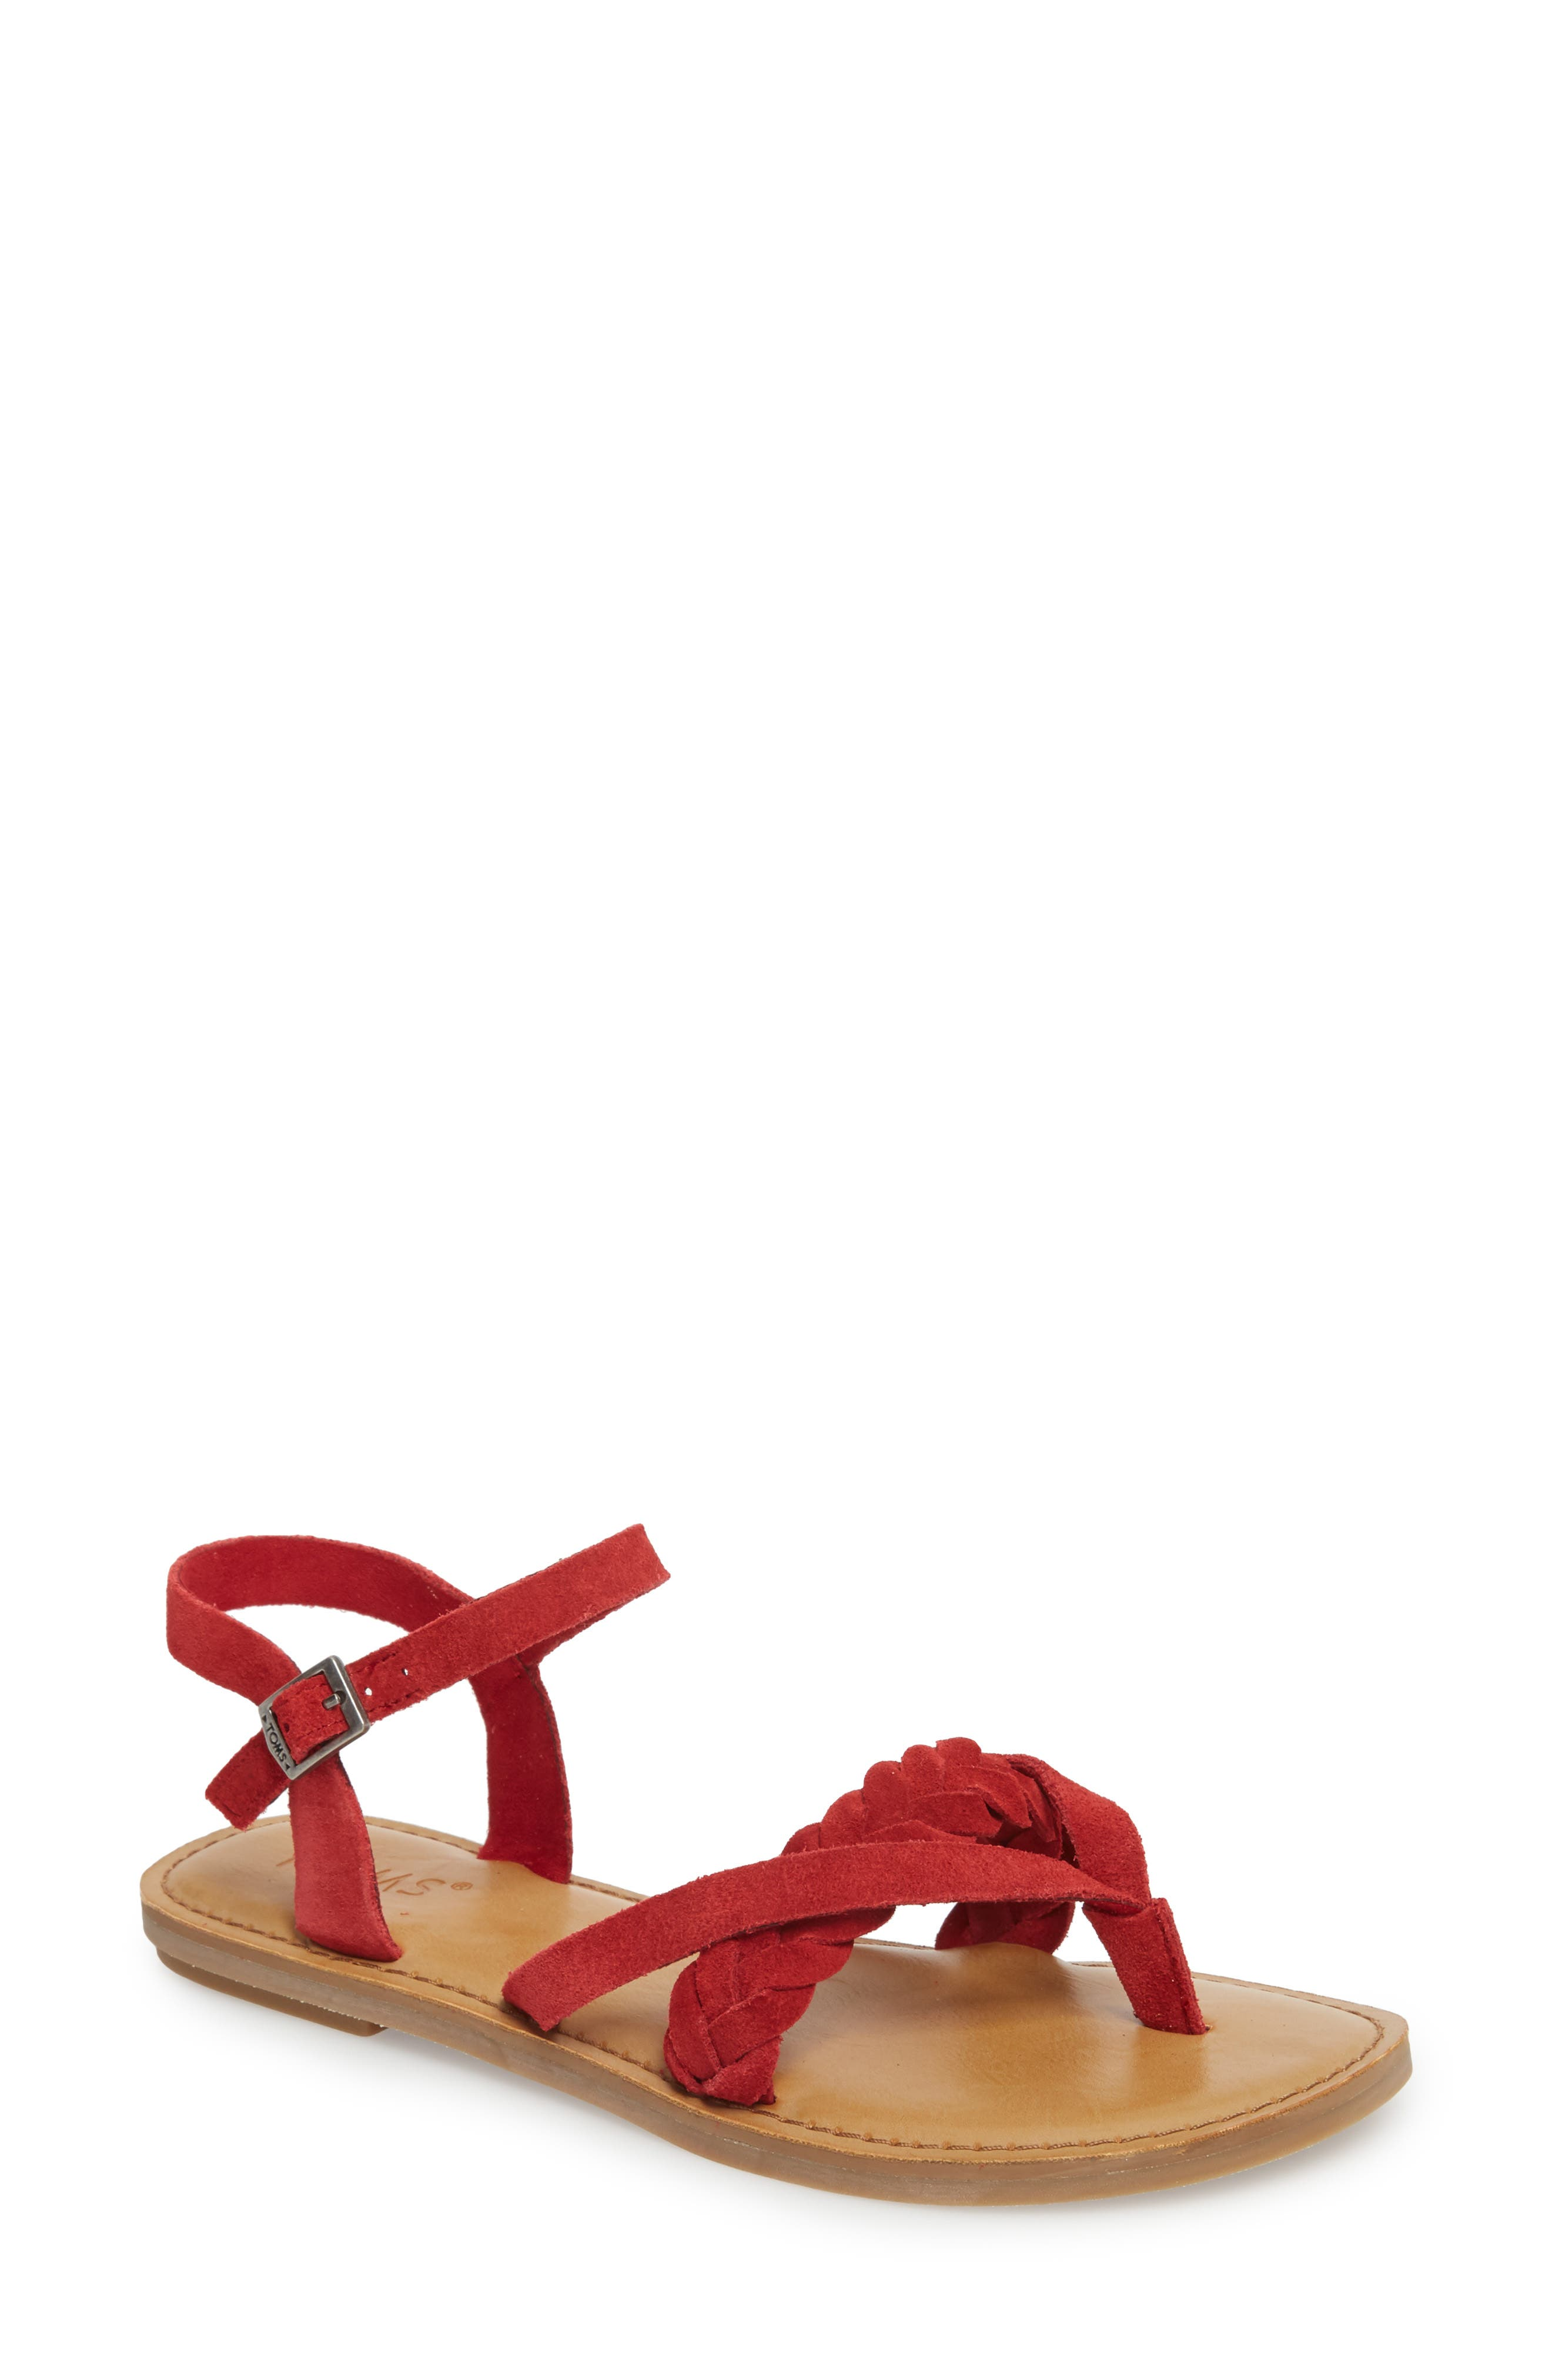 'Lexie' Sandal,                             Main thumbnail 1, color,                             601